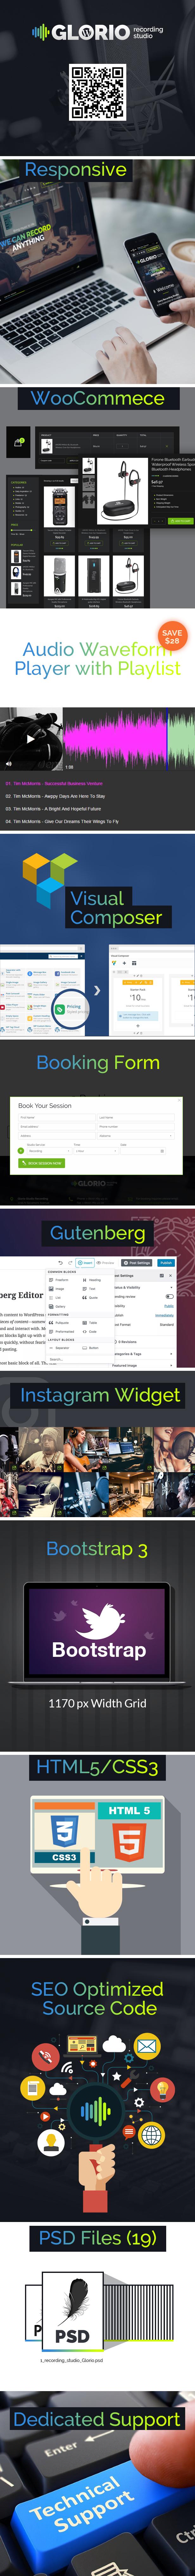 Presentation for GLORIO Recording Studio WordPress Template